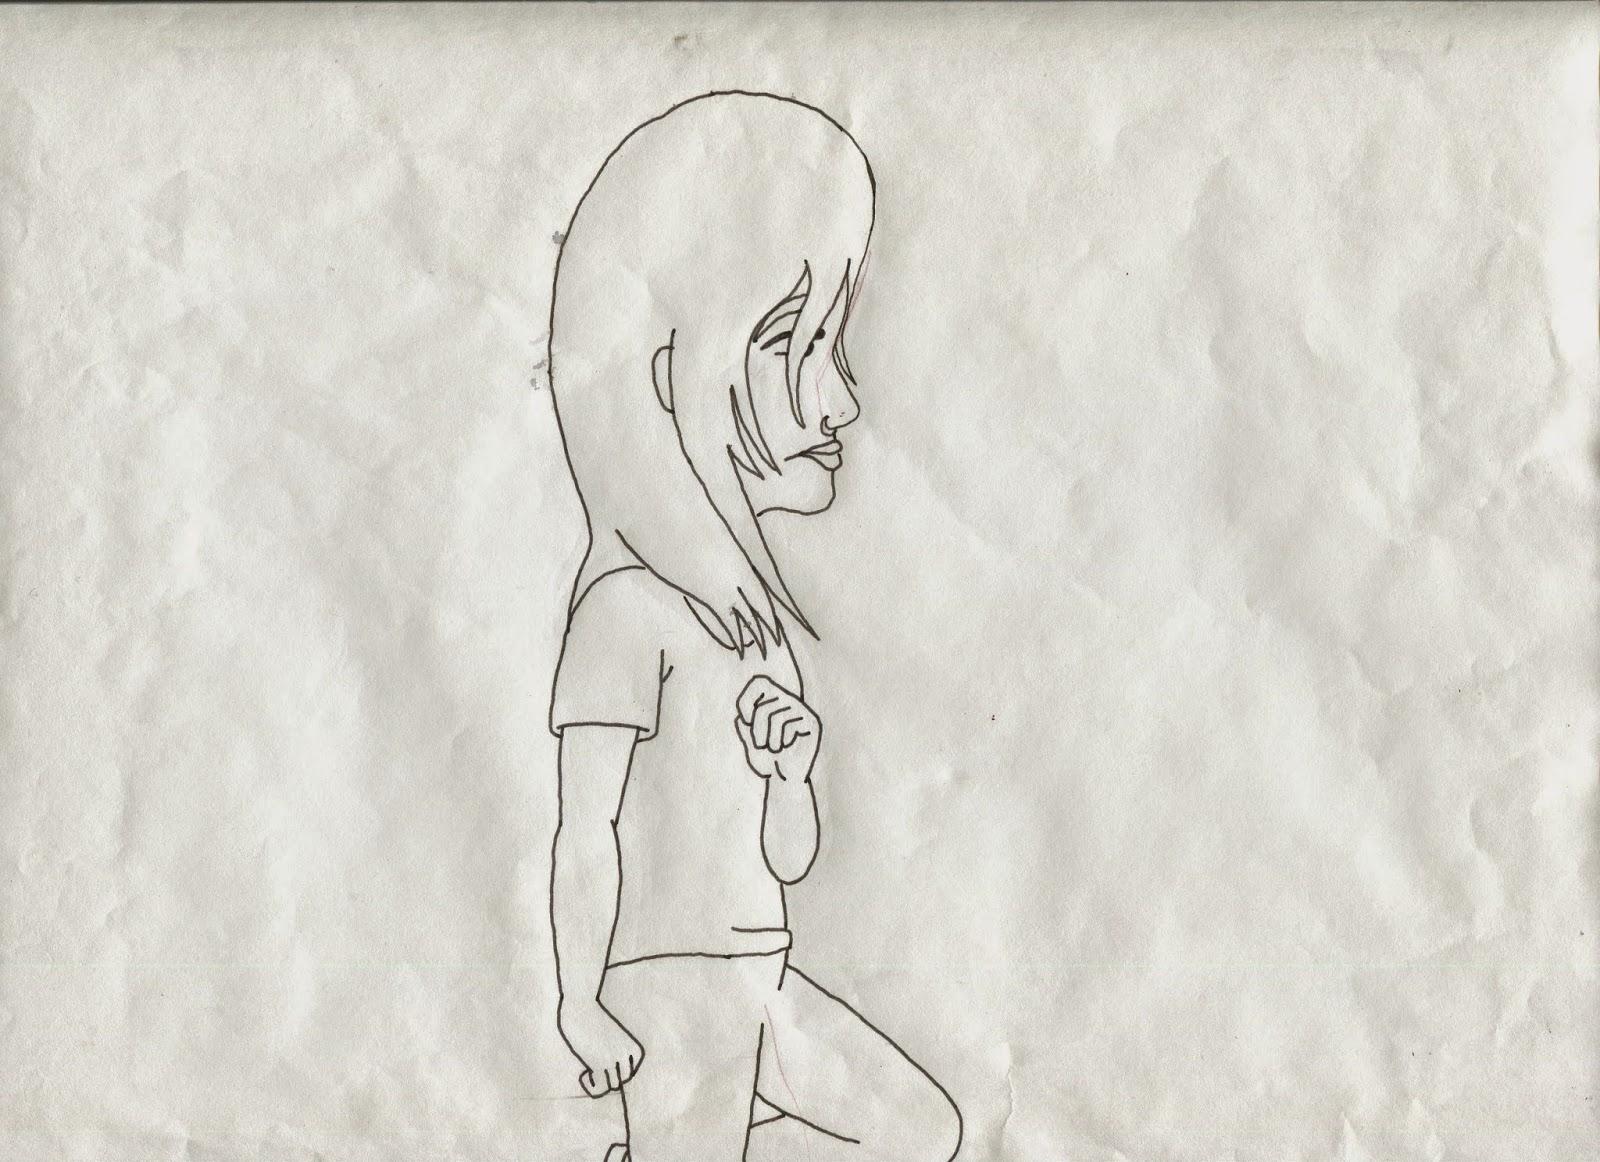 One Line Art Animation : Studio practice: applied animation development: the long overdue